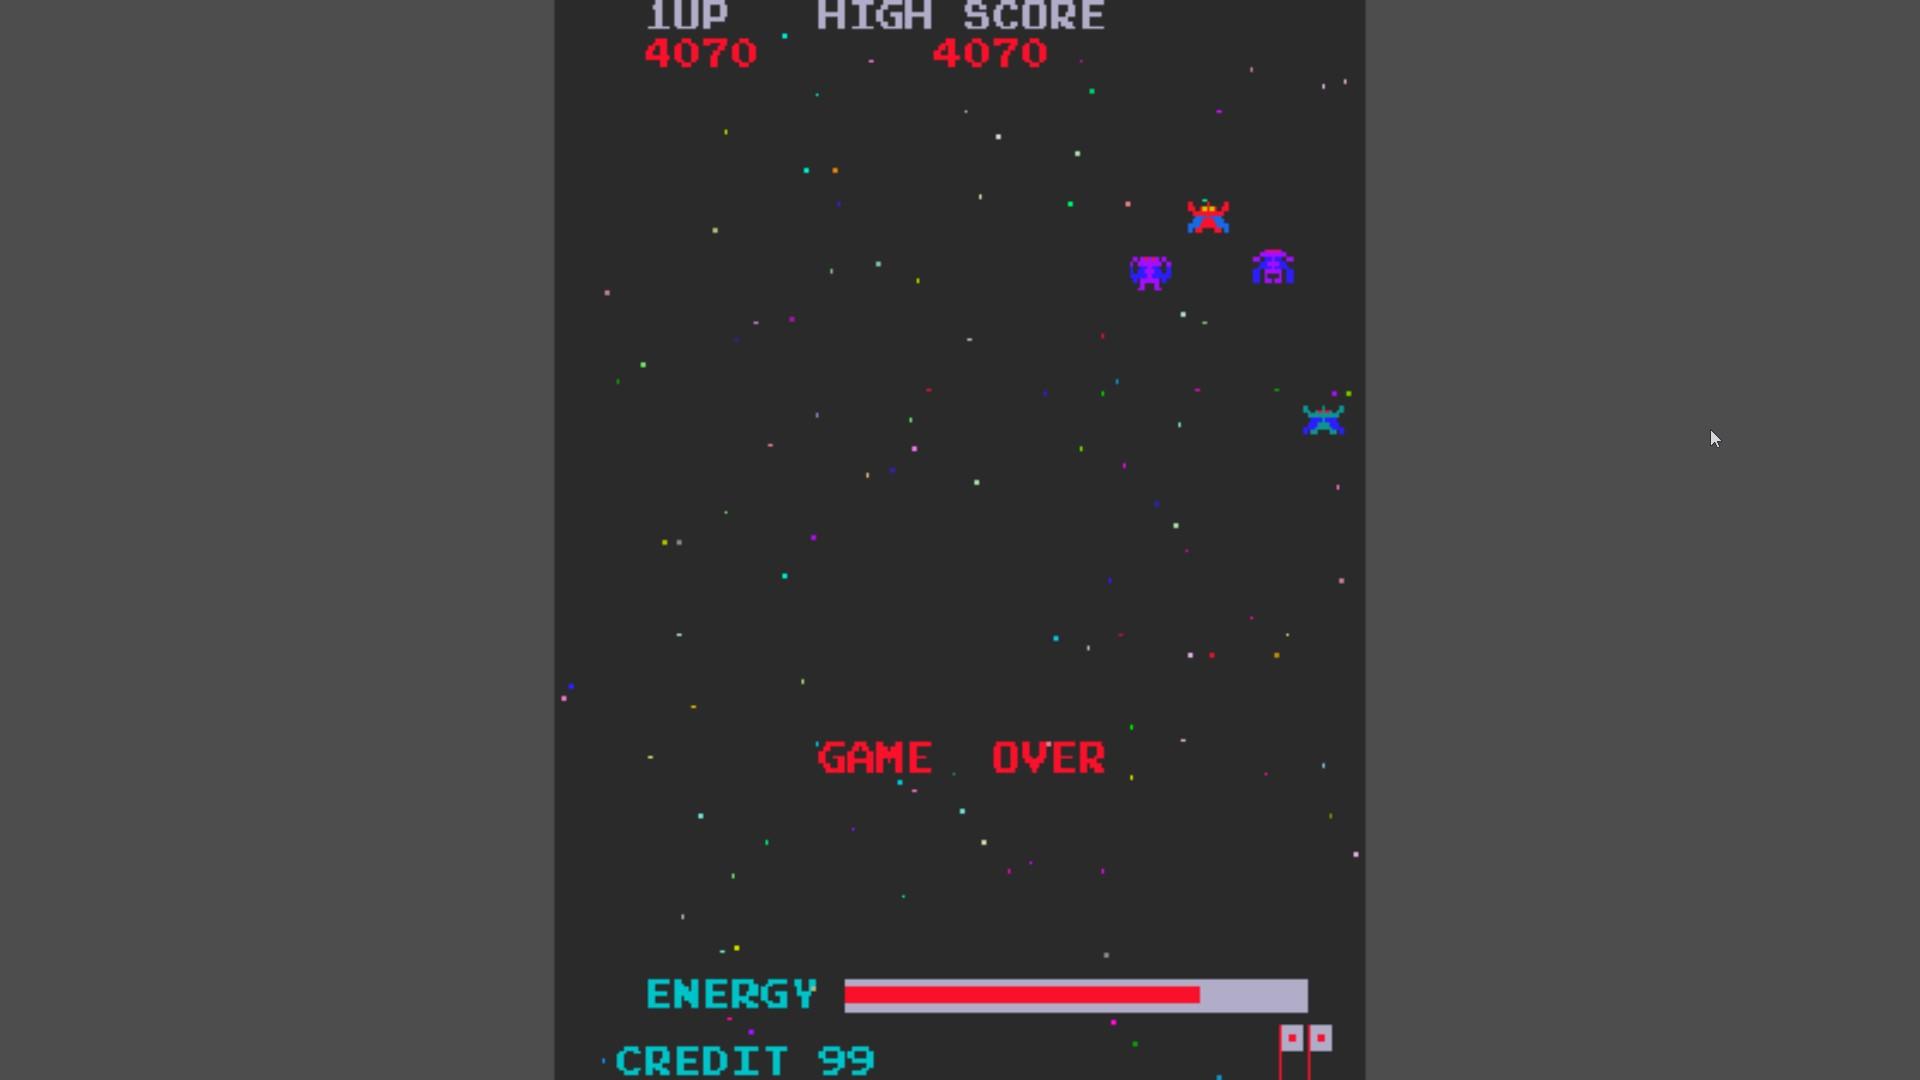 AkinNahtanoj: Moon Alien Part 2 [moonal2] (Arcade Emulated / M.A.M.E.) 4,070 points on 2020-10-18 05:24:25